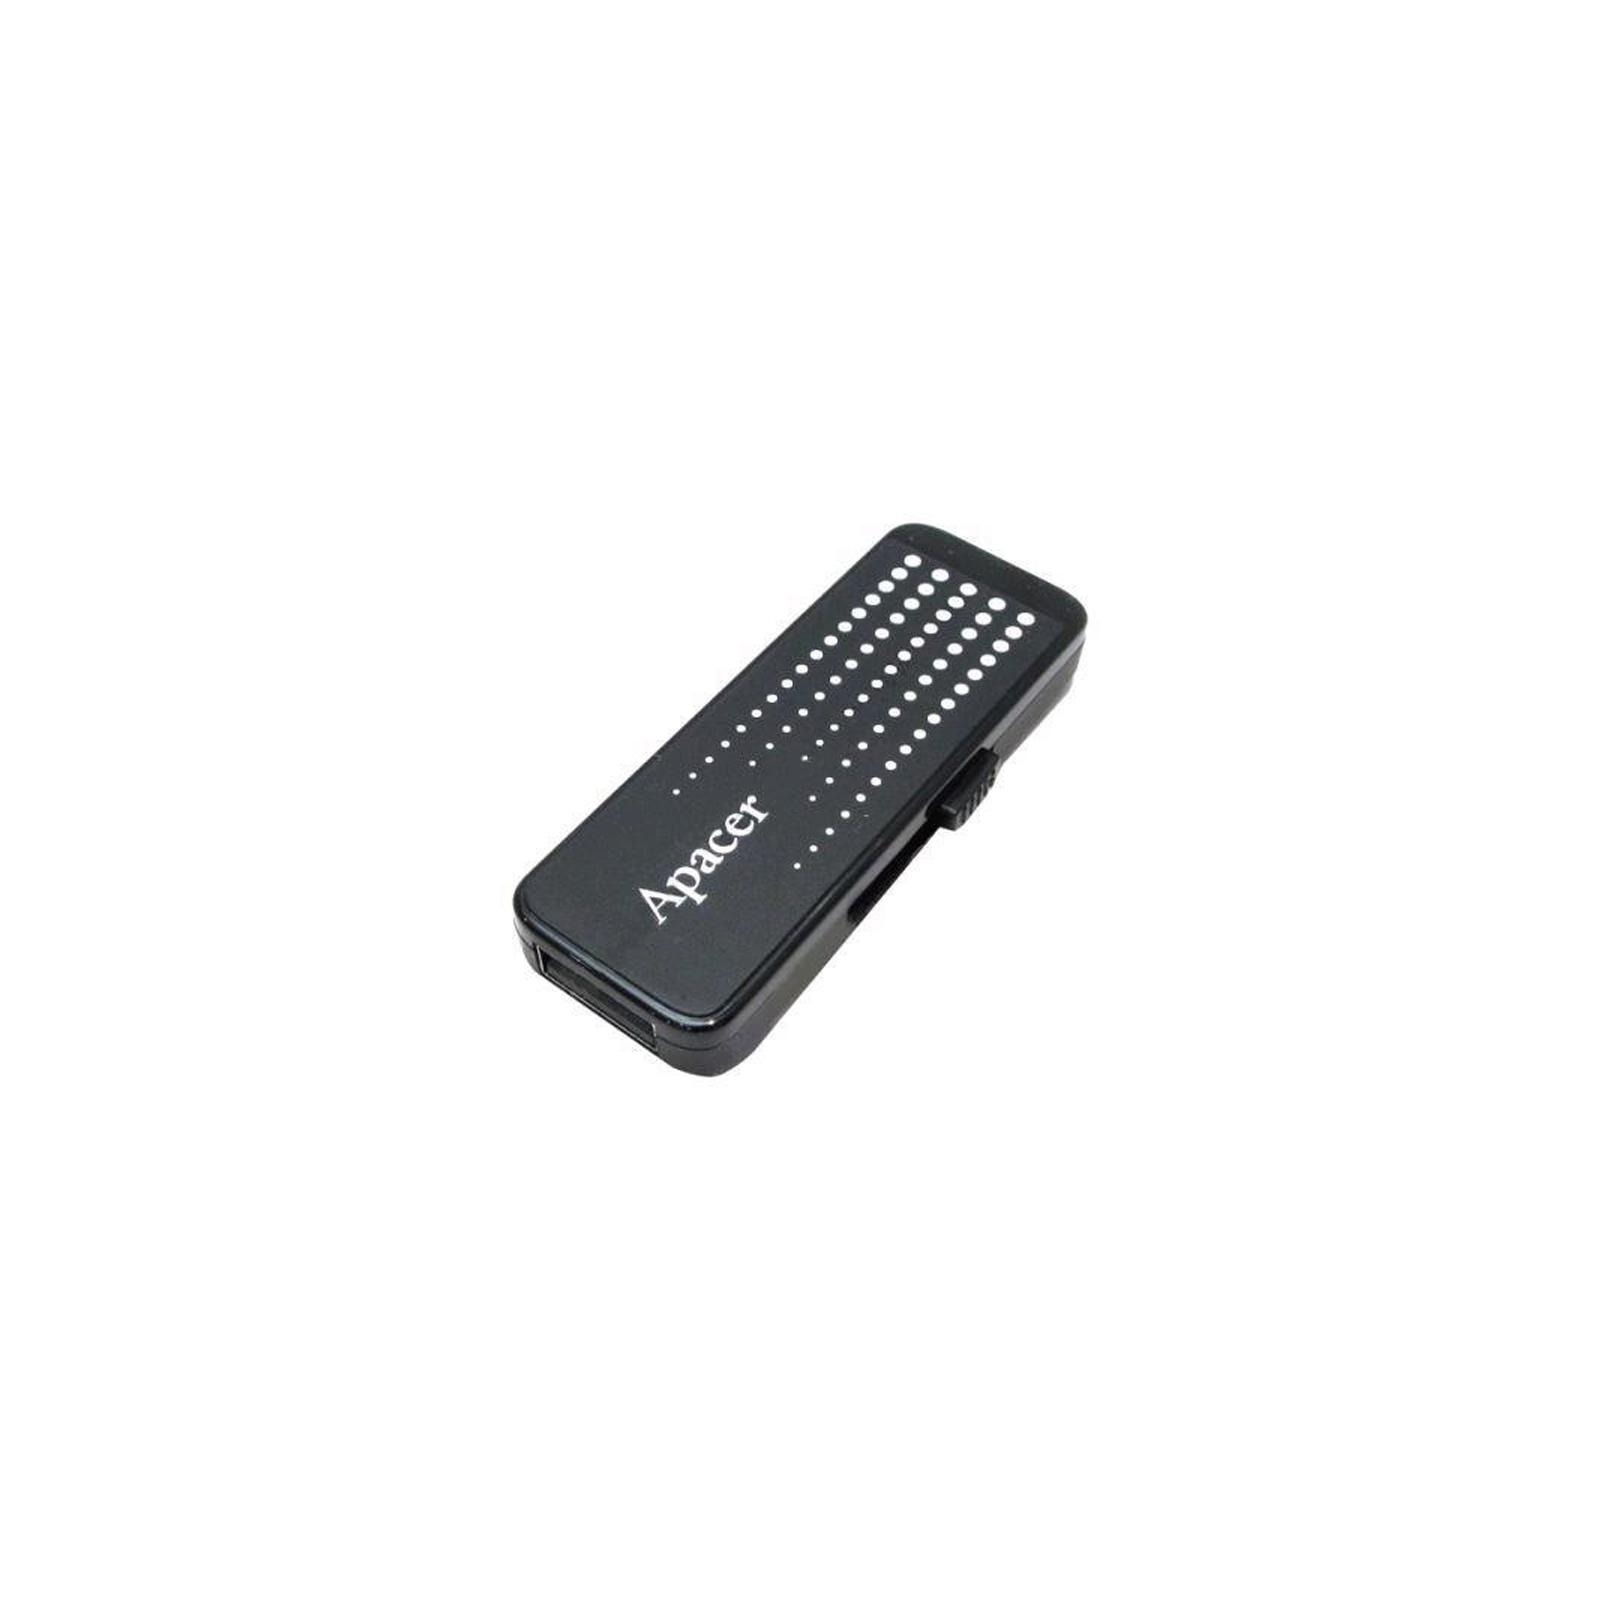 USB флеш накопитель Handy Steno AH323 black Apacer (AP8GAH323B-1) изображение 2